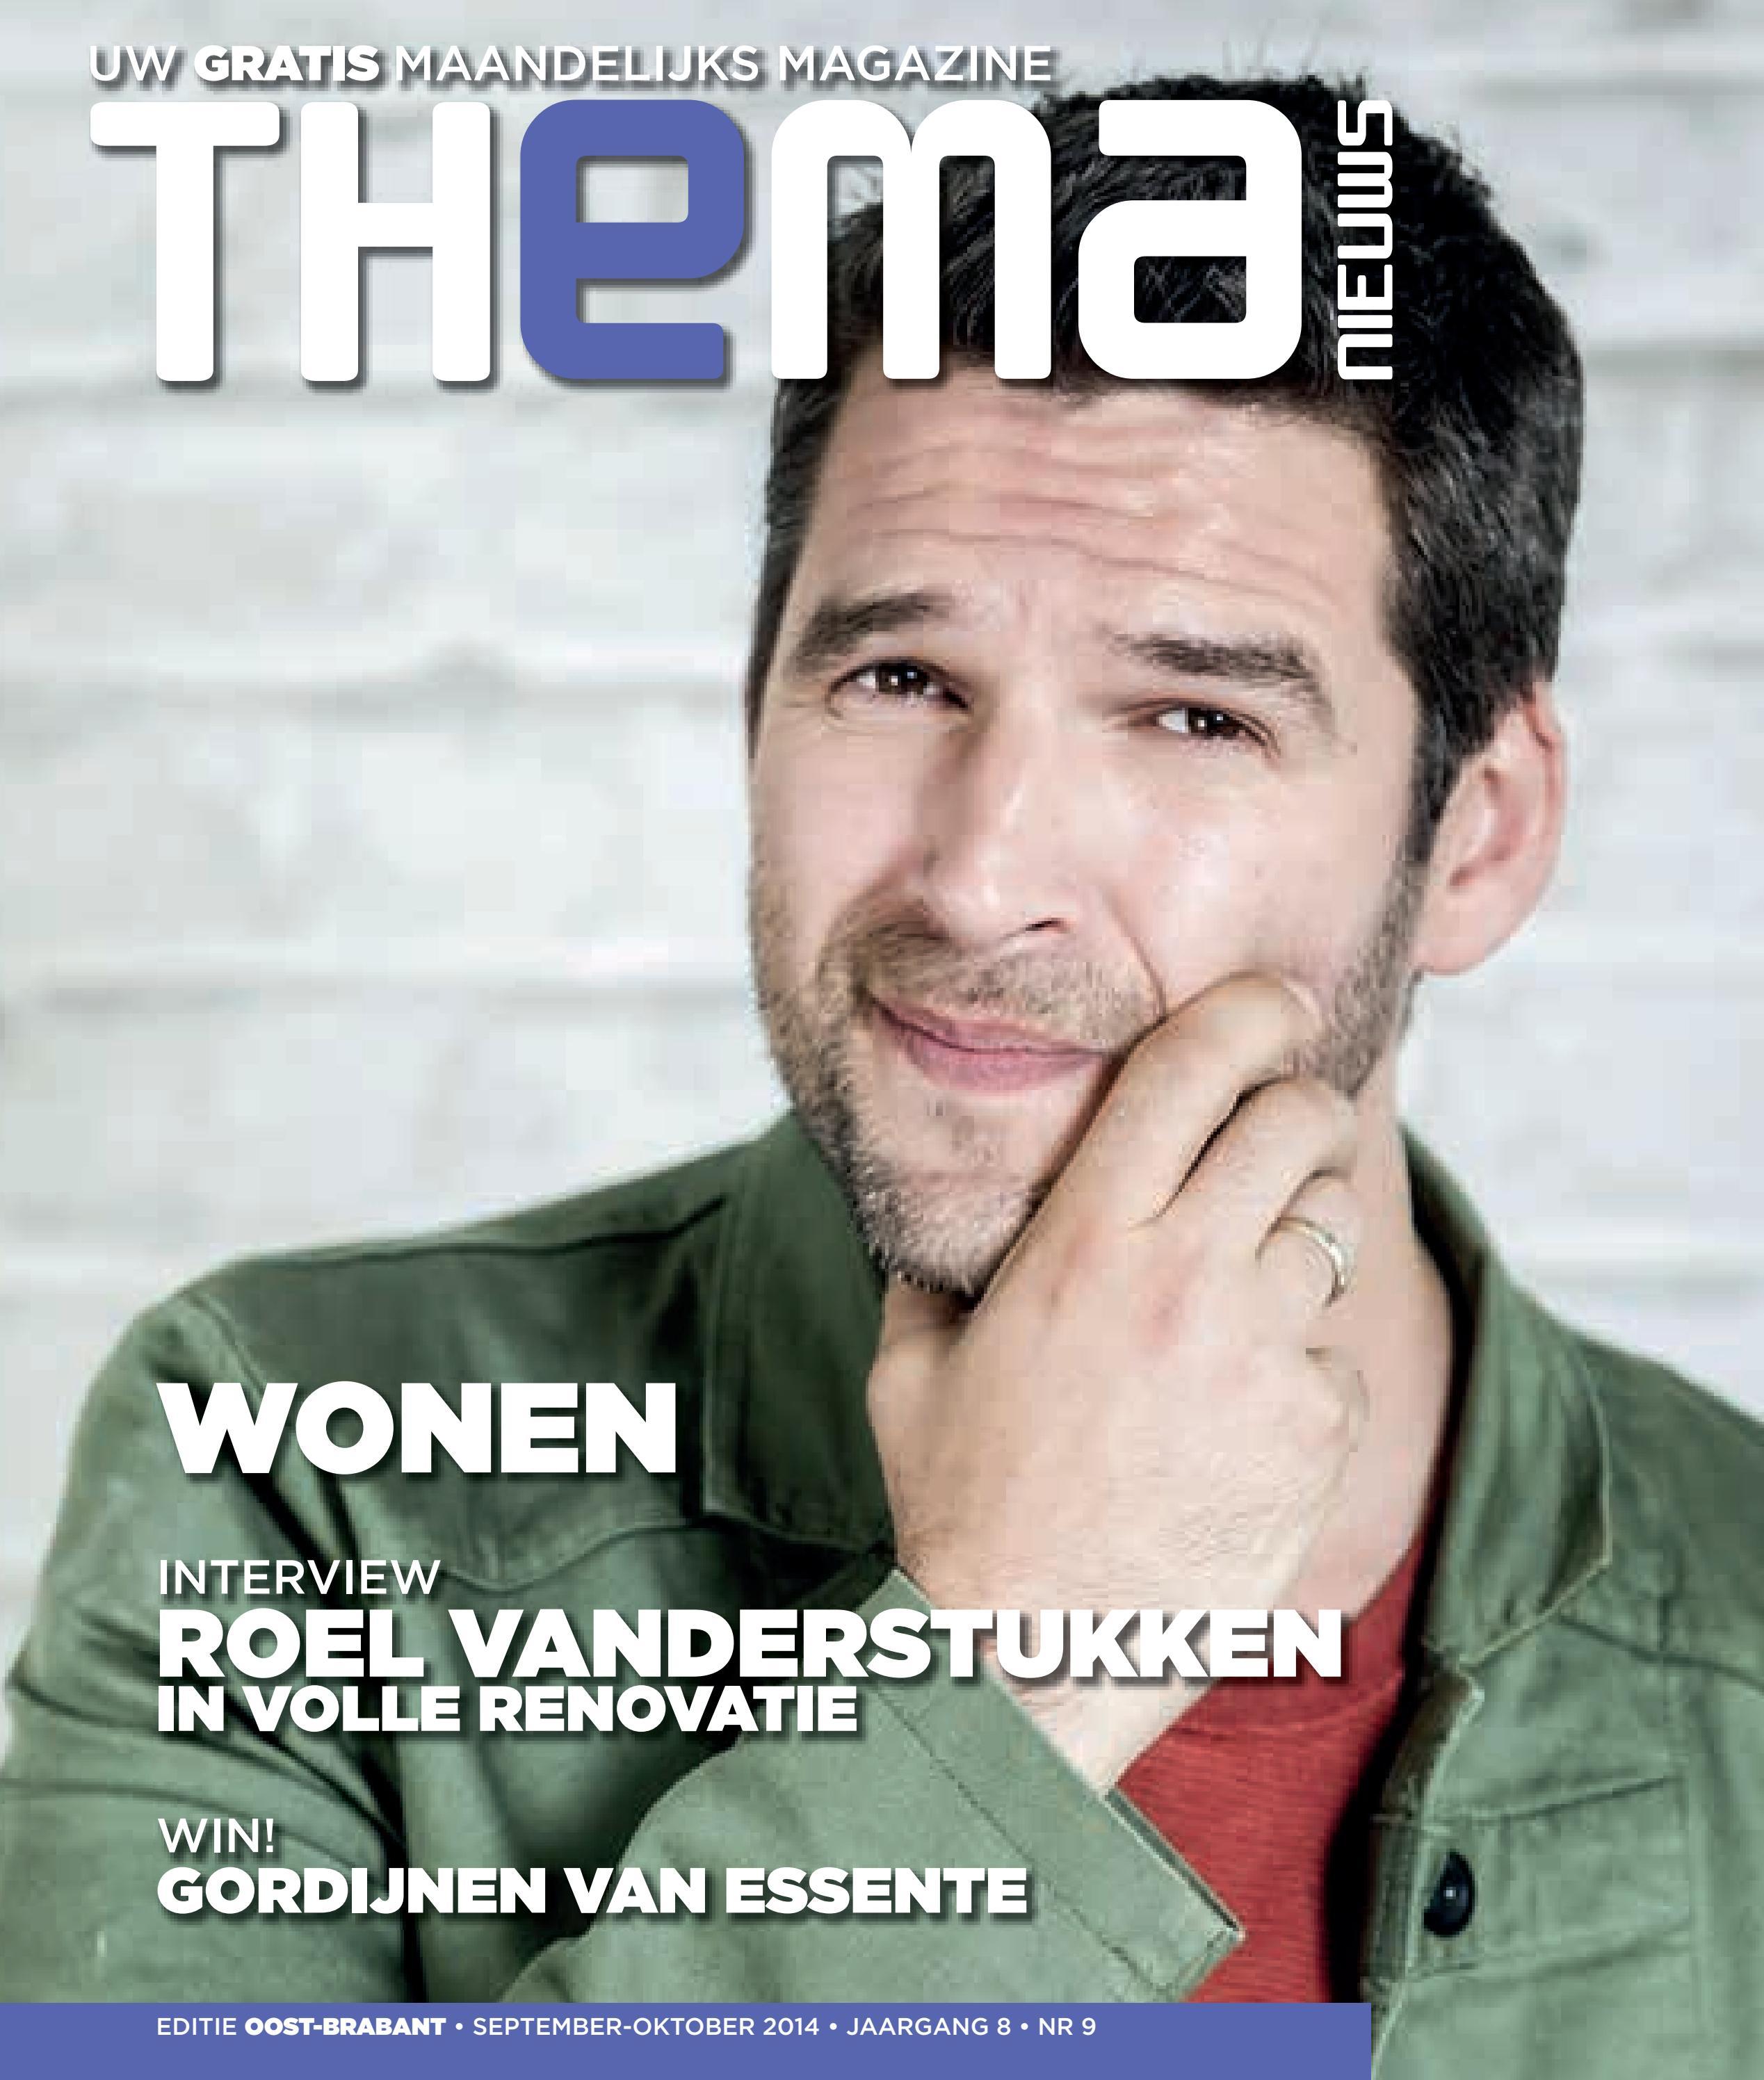 Thema nieuws wonen najaar 2014 by primetime   issuu